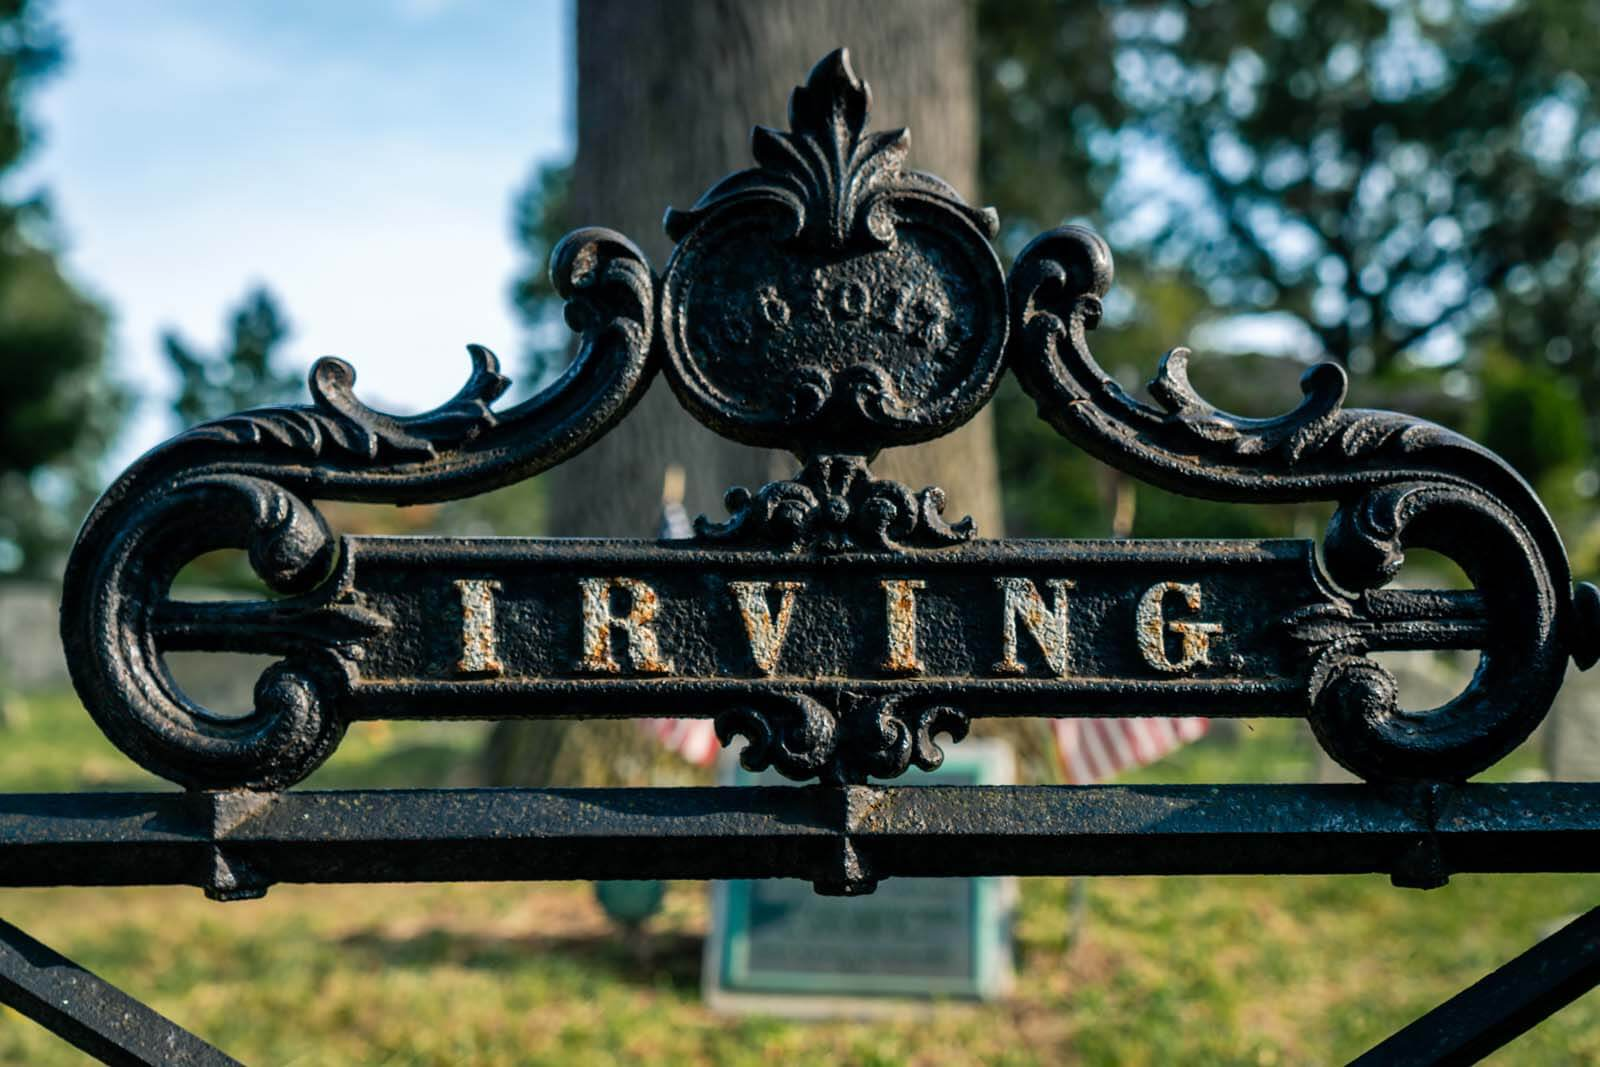 Washington Irvings family plot in Sleepy Hollow Cemetery